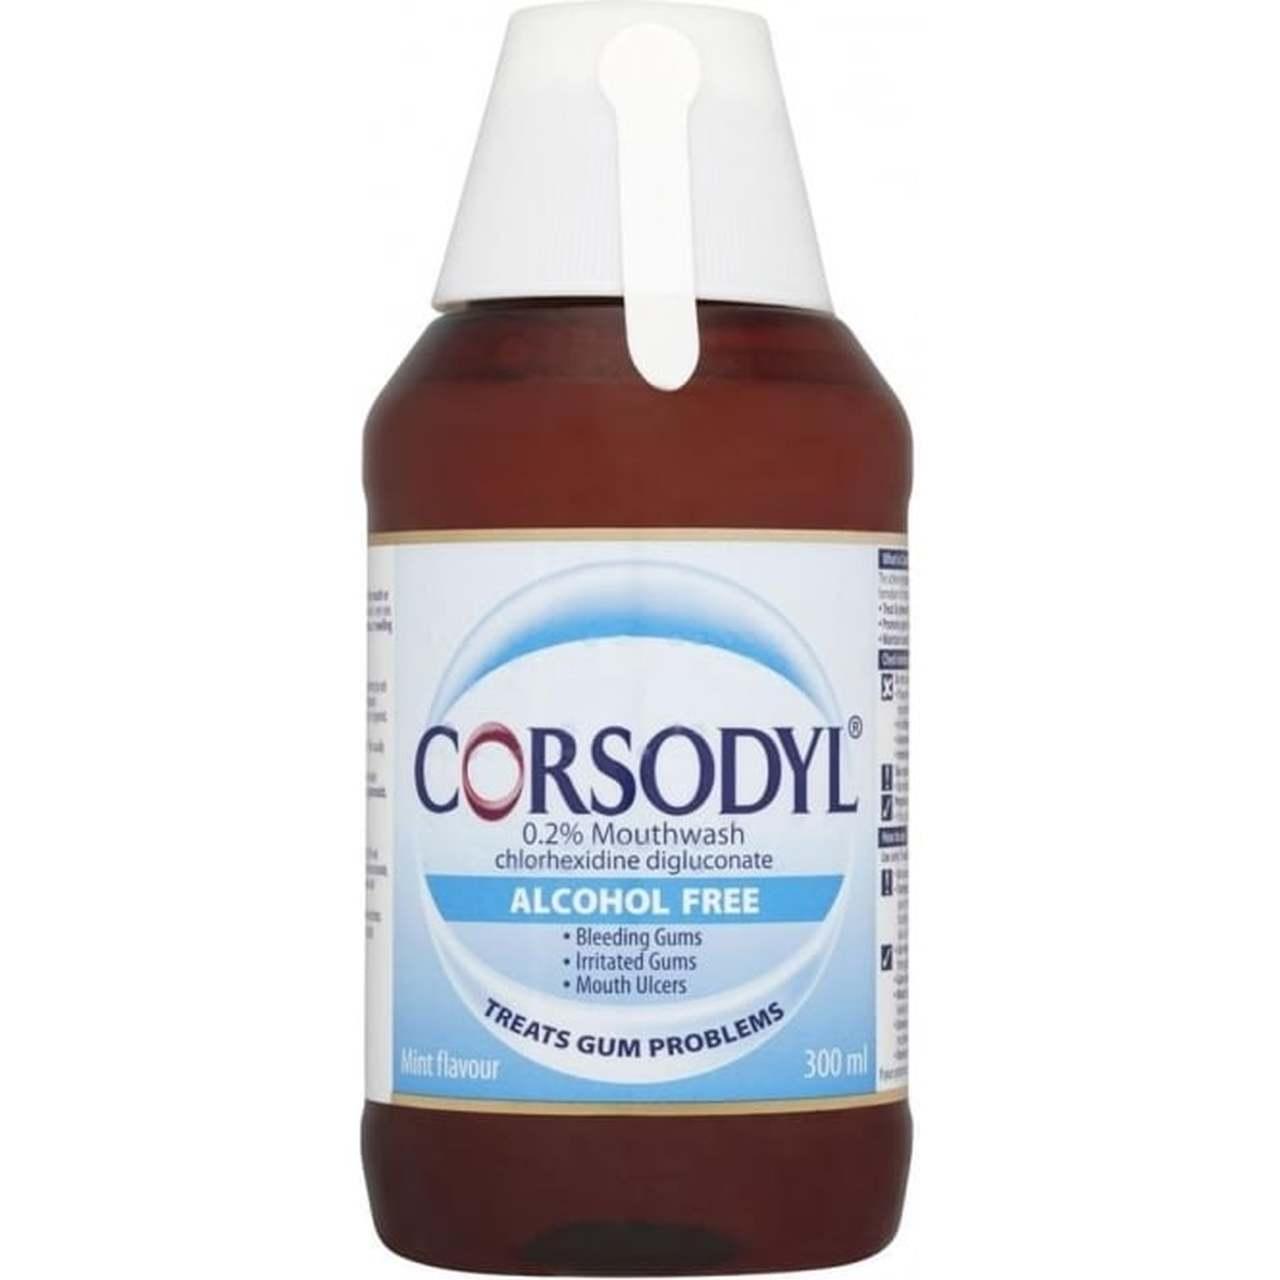 CORSODYL 0.2% MINT MOUTHWASH 300ML